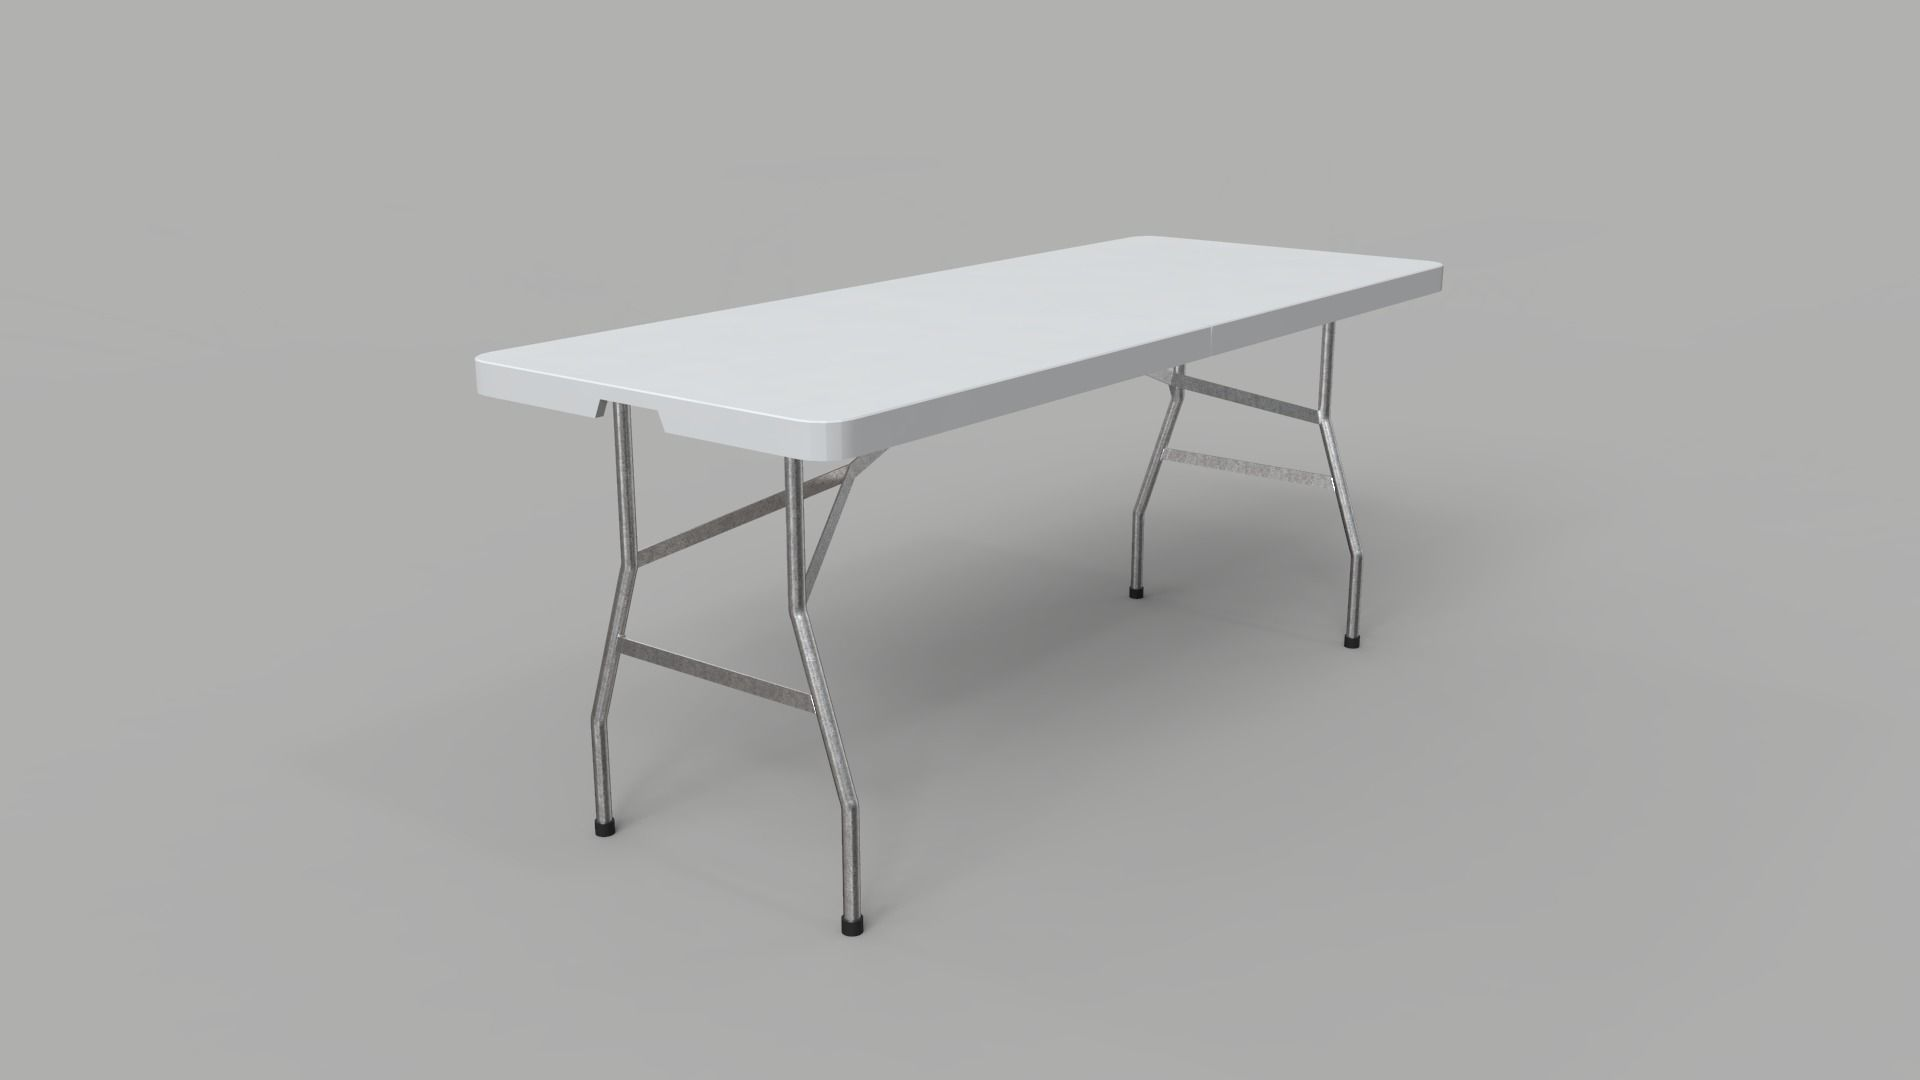 Folding Table - 6 Ft